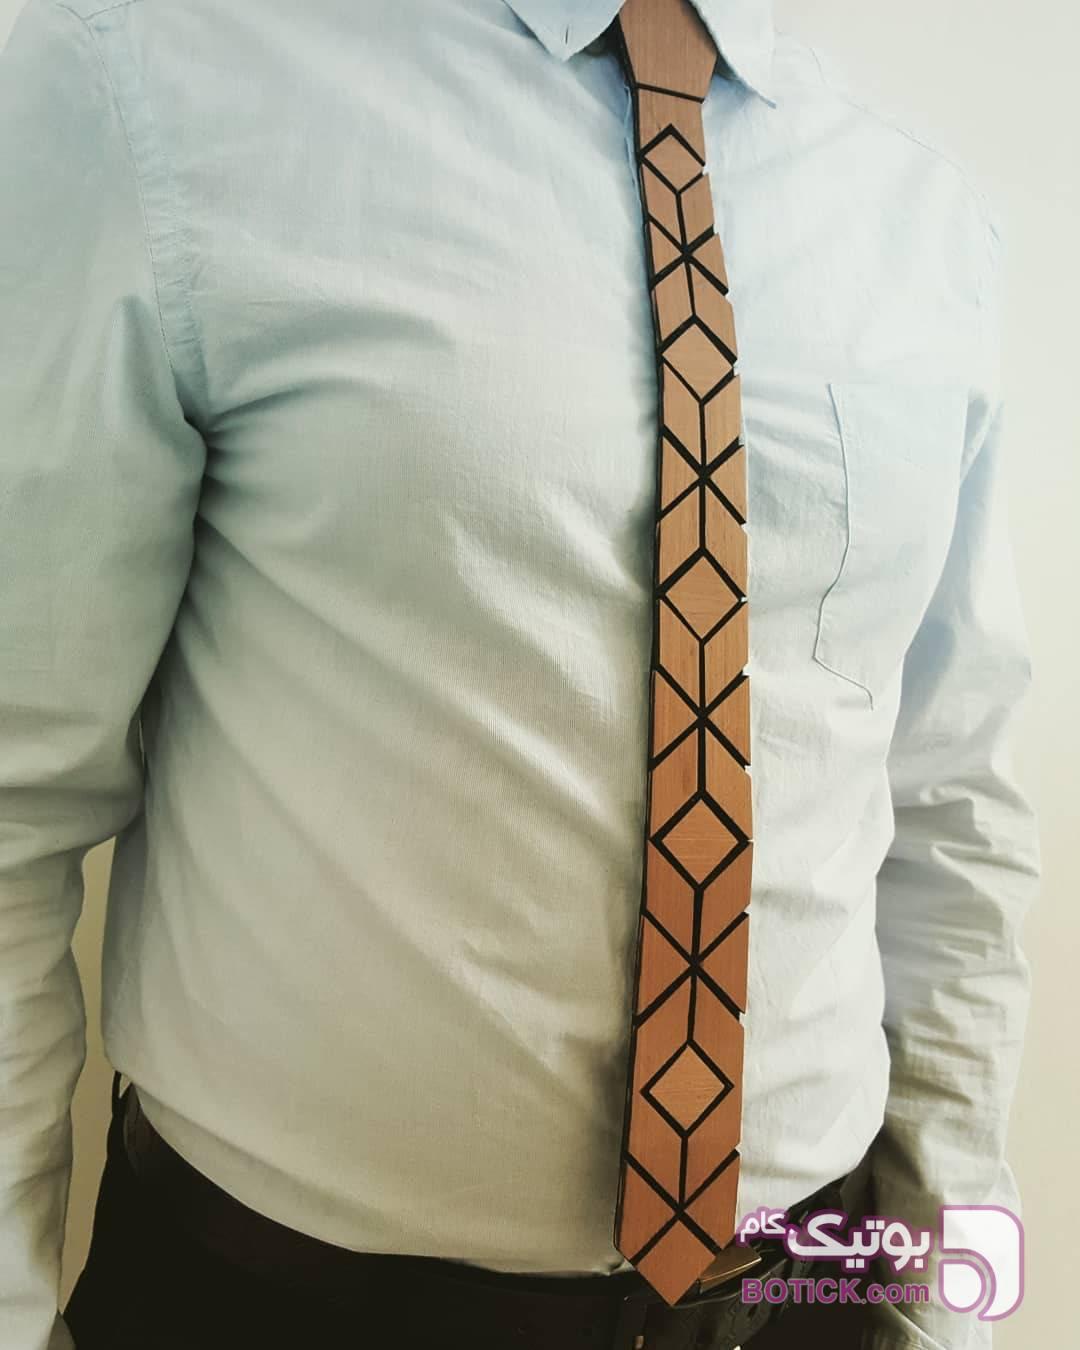 کراوات چوبی مشکی كراوات و پاپيون